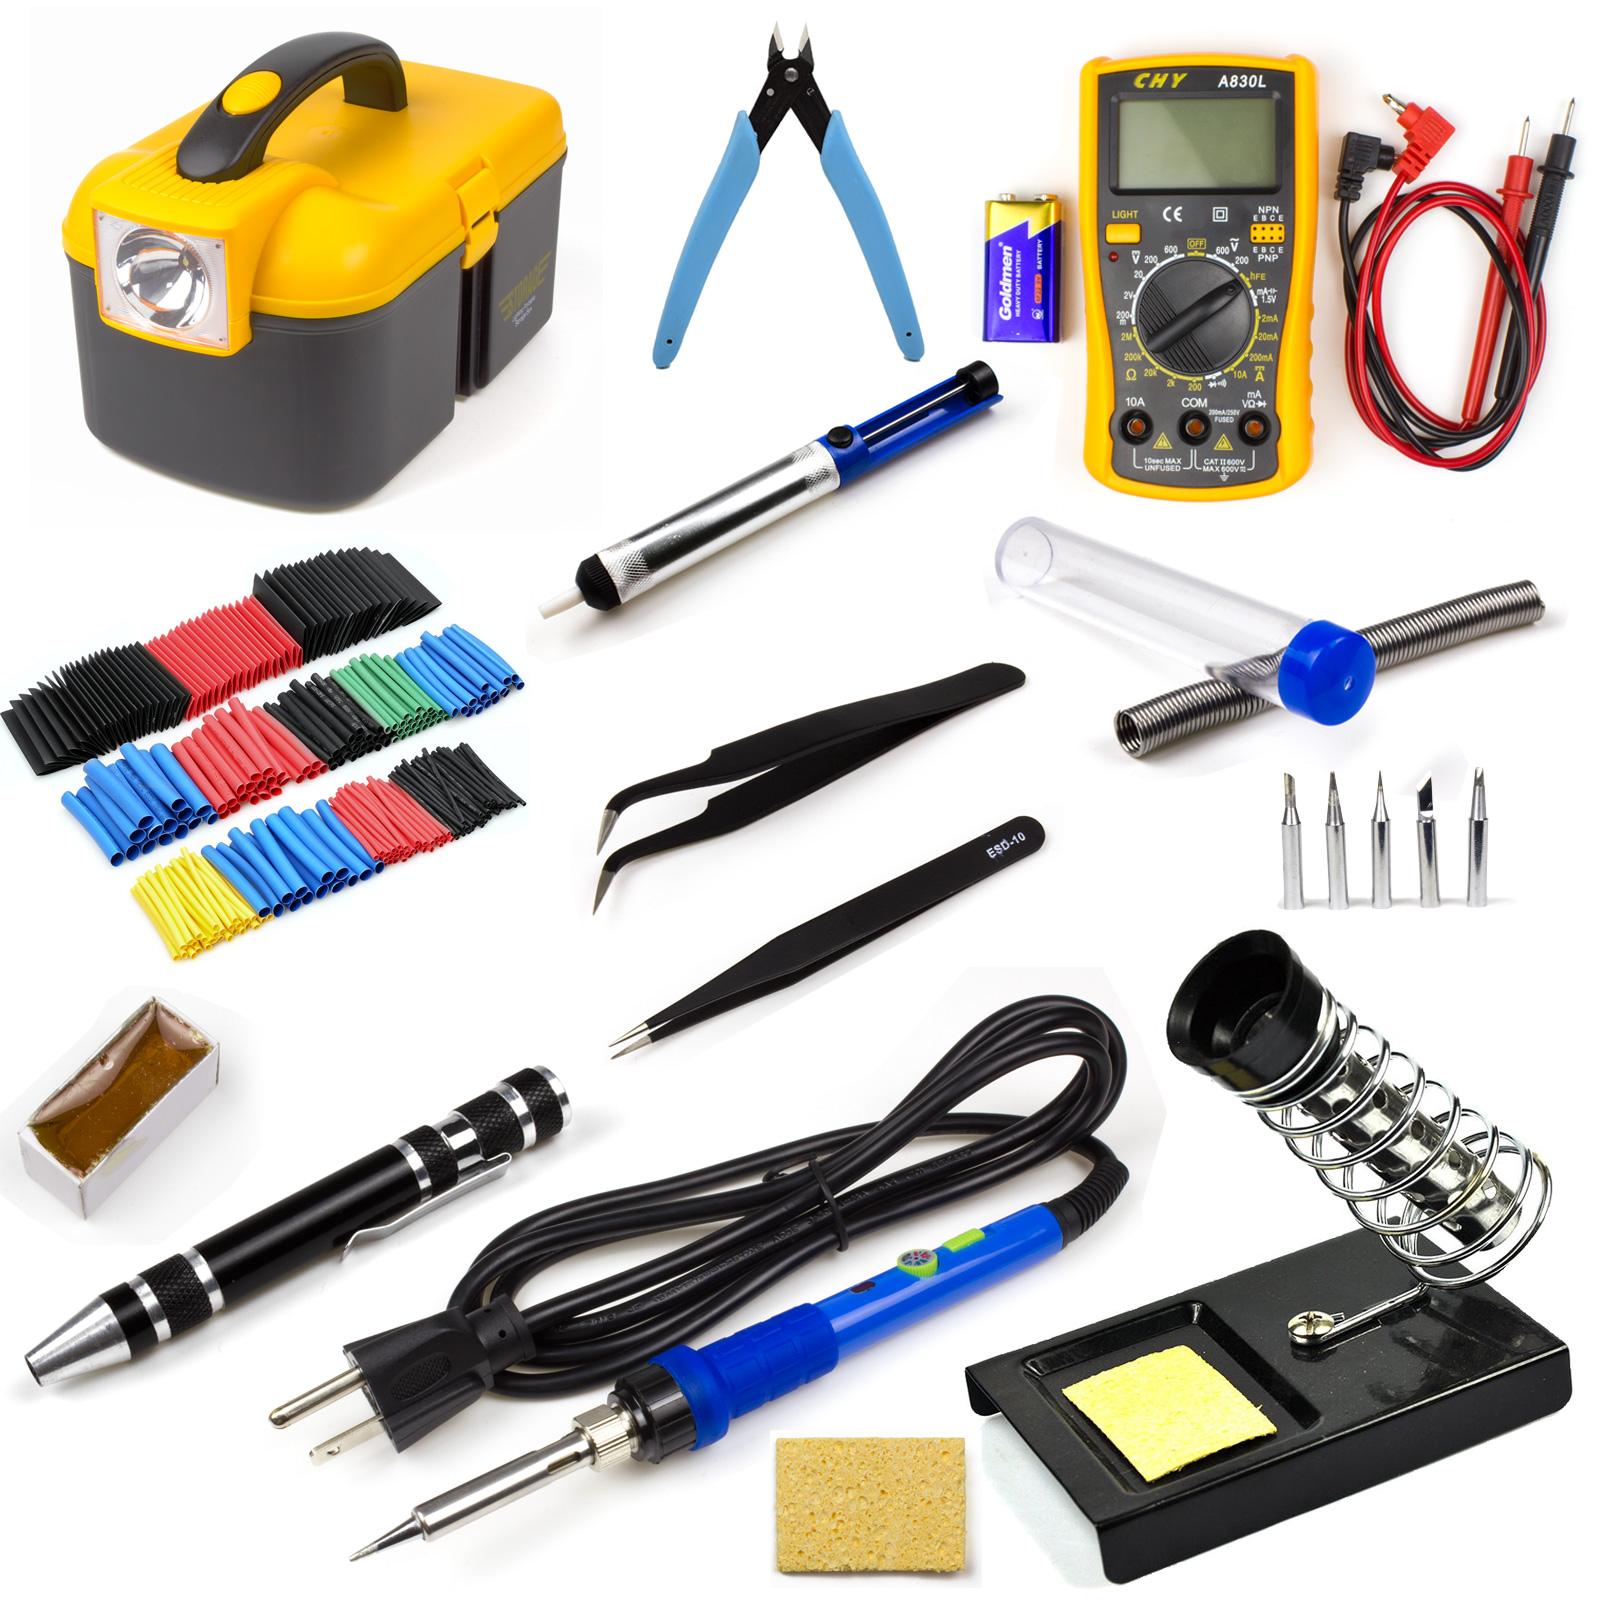 electric soldering iron tool kit 60w welding gun digital. Black Bedroom Furniture Sets. Home Design Ideas